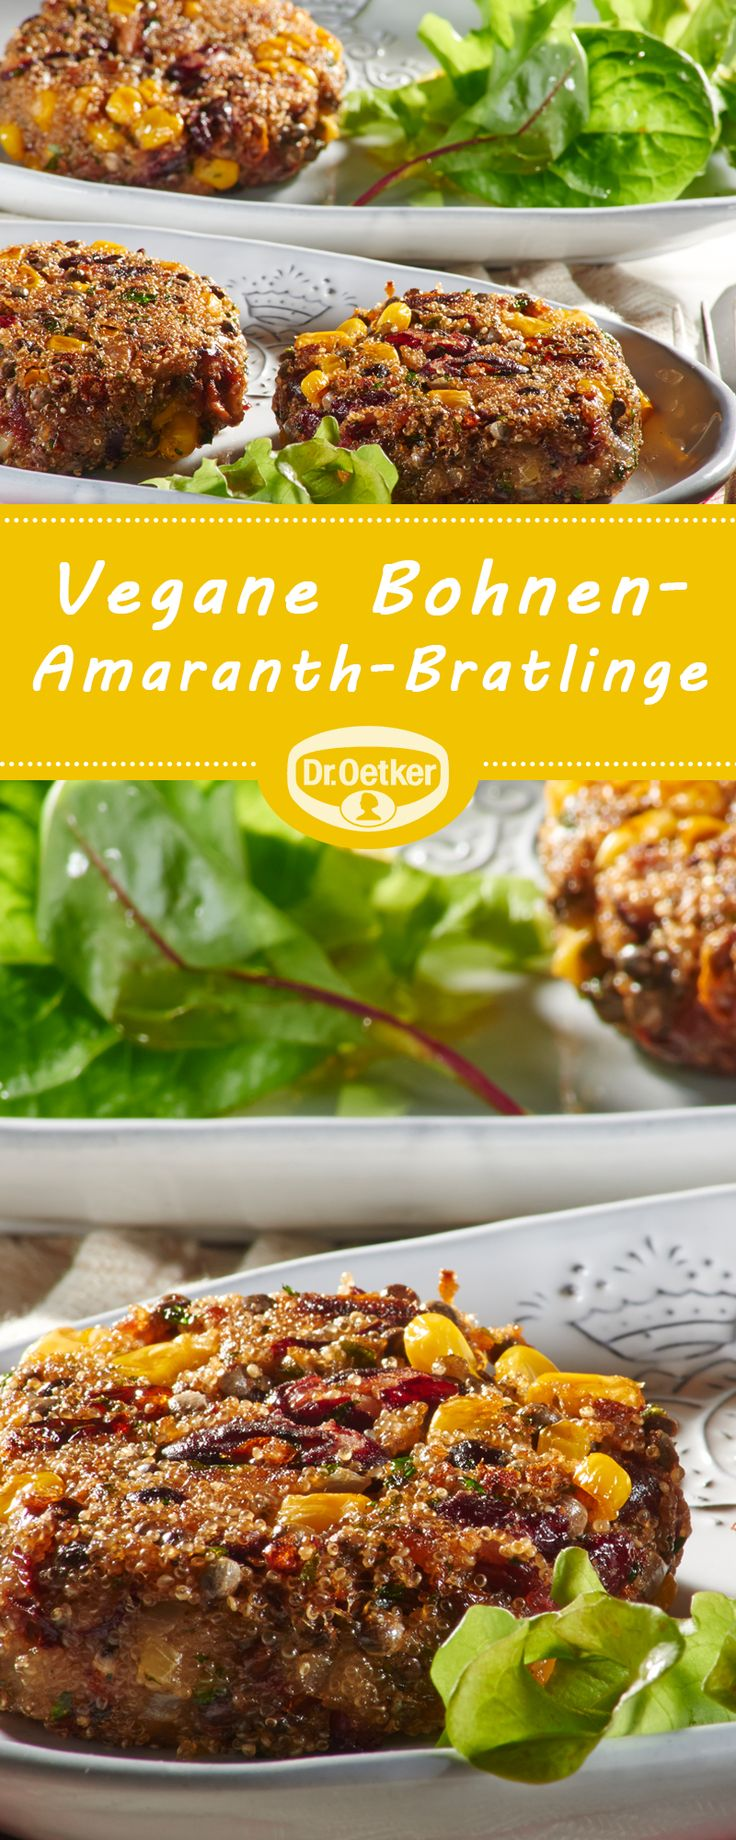 Vegane Bohnen-Amaranth-Bratlinge: Pikante Bratlinge mit viel Gemüse - vegan, vegetarisch, lactosefrei